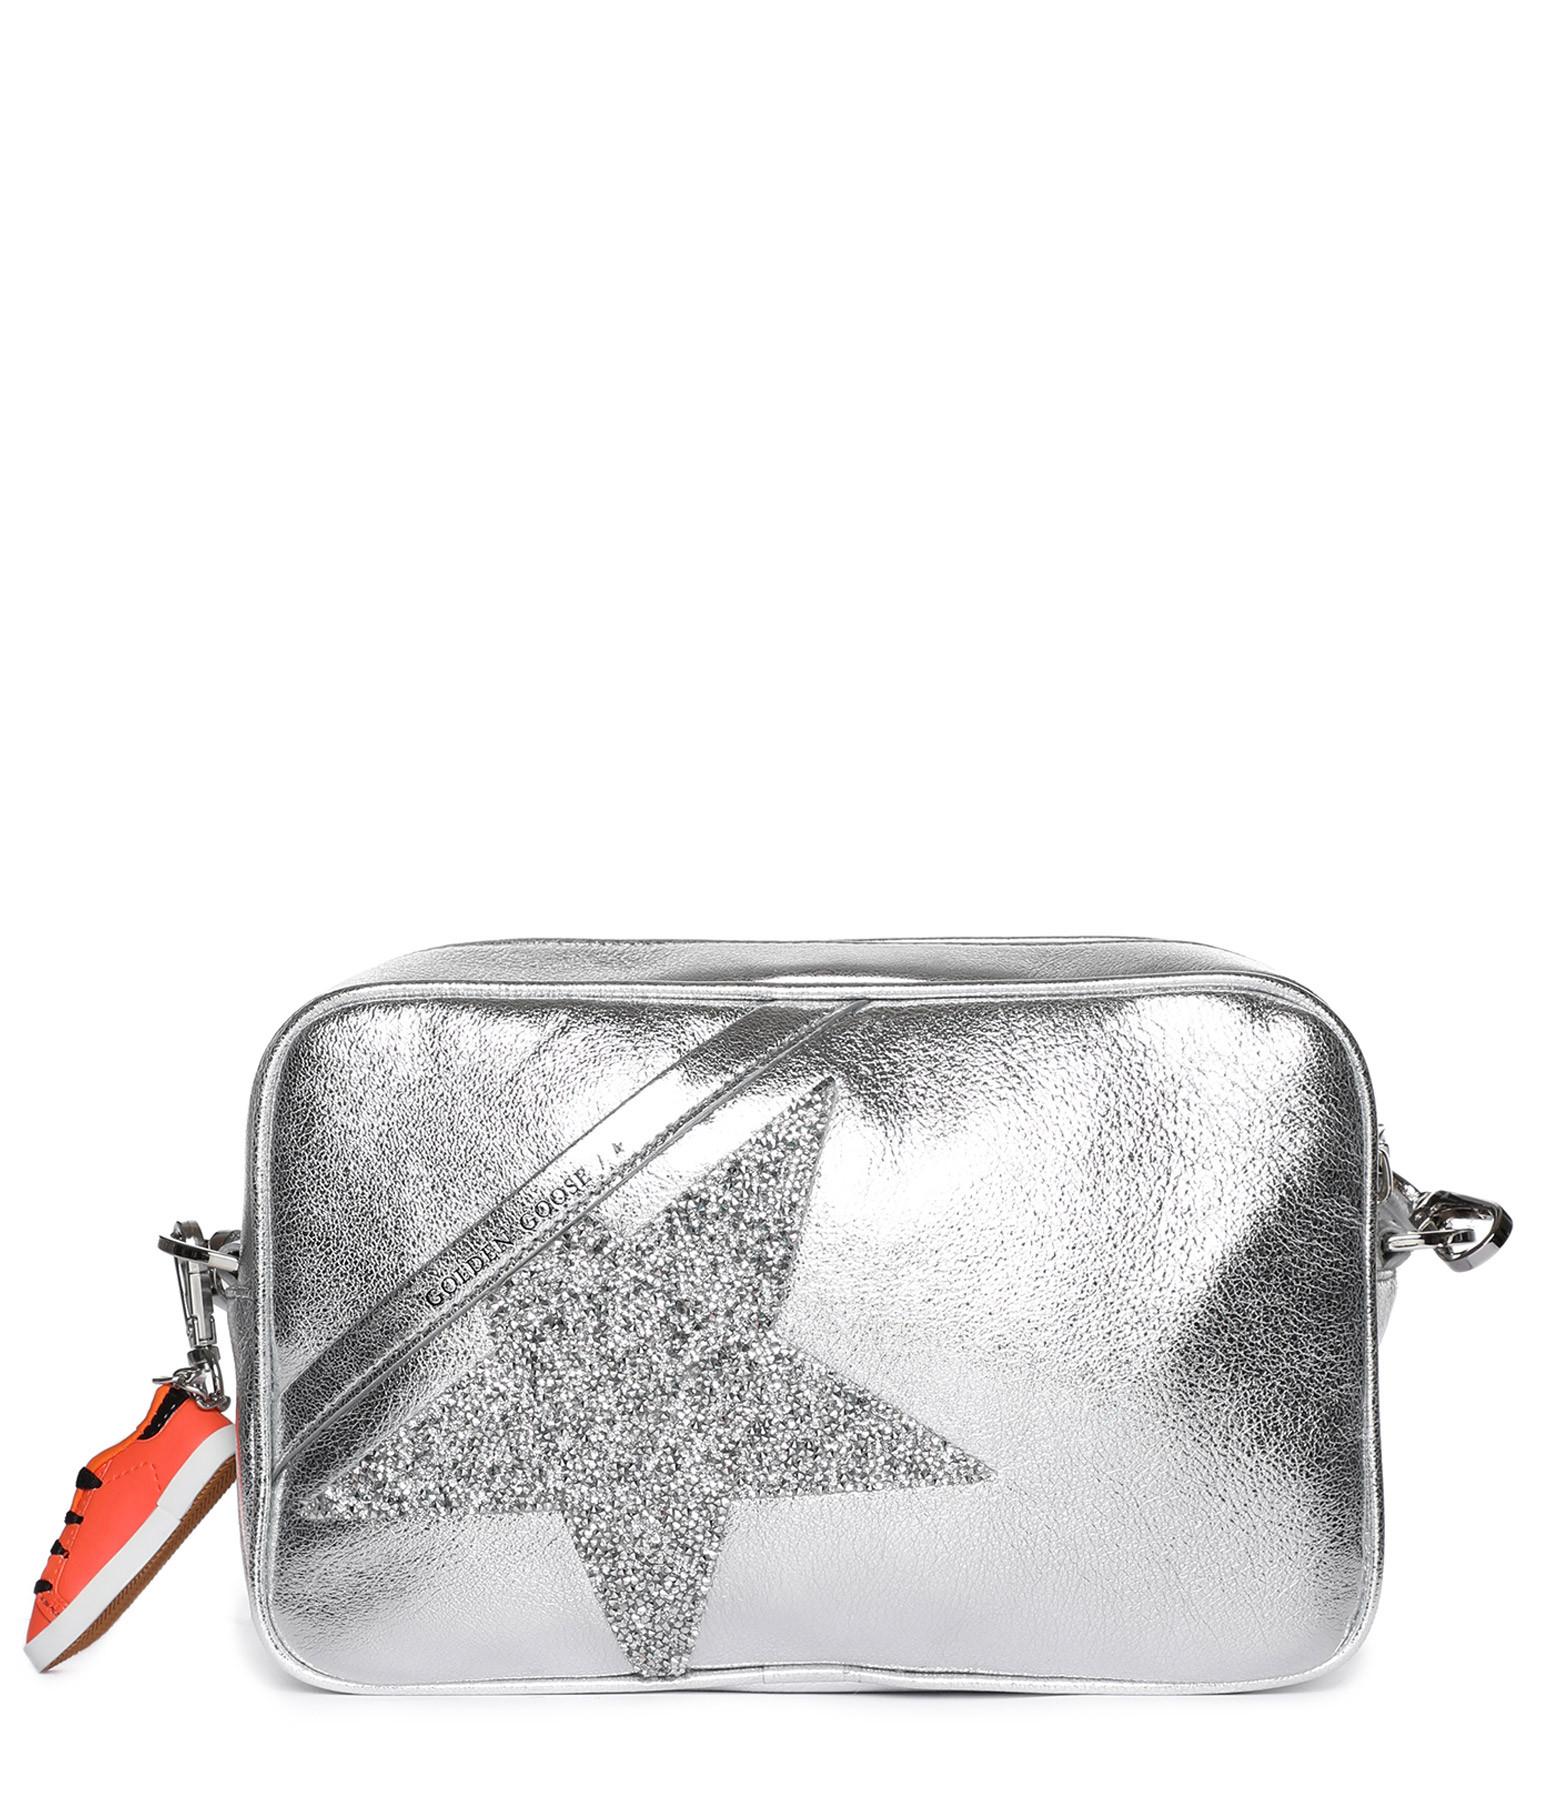 GOLDEN GOOSE - Sac Star Cuir Lisse Étoile Gris Swarovski Crystal